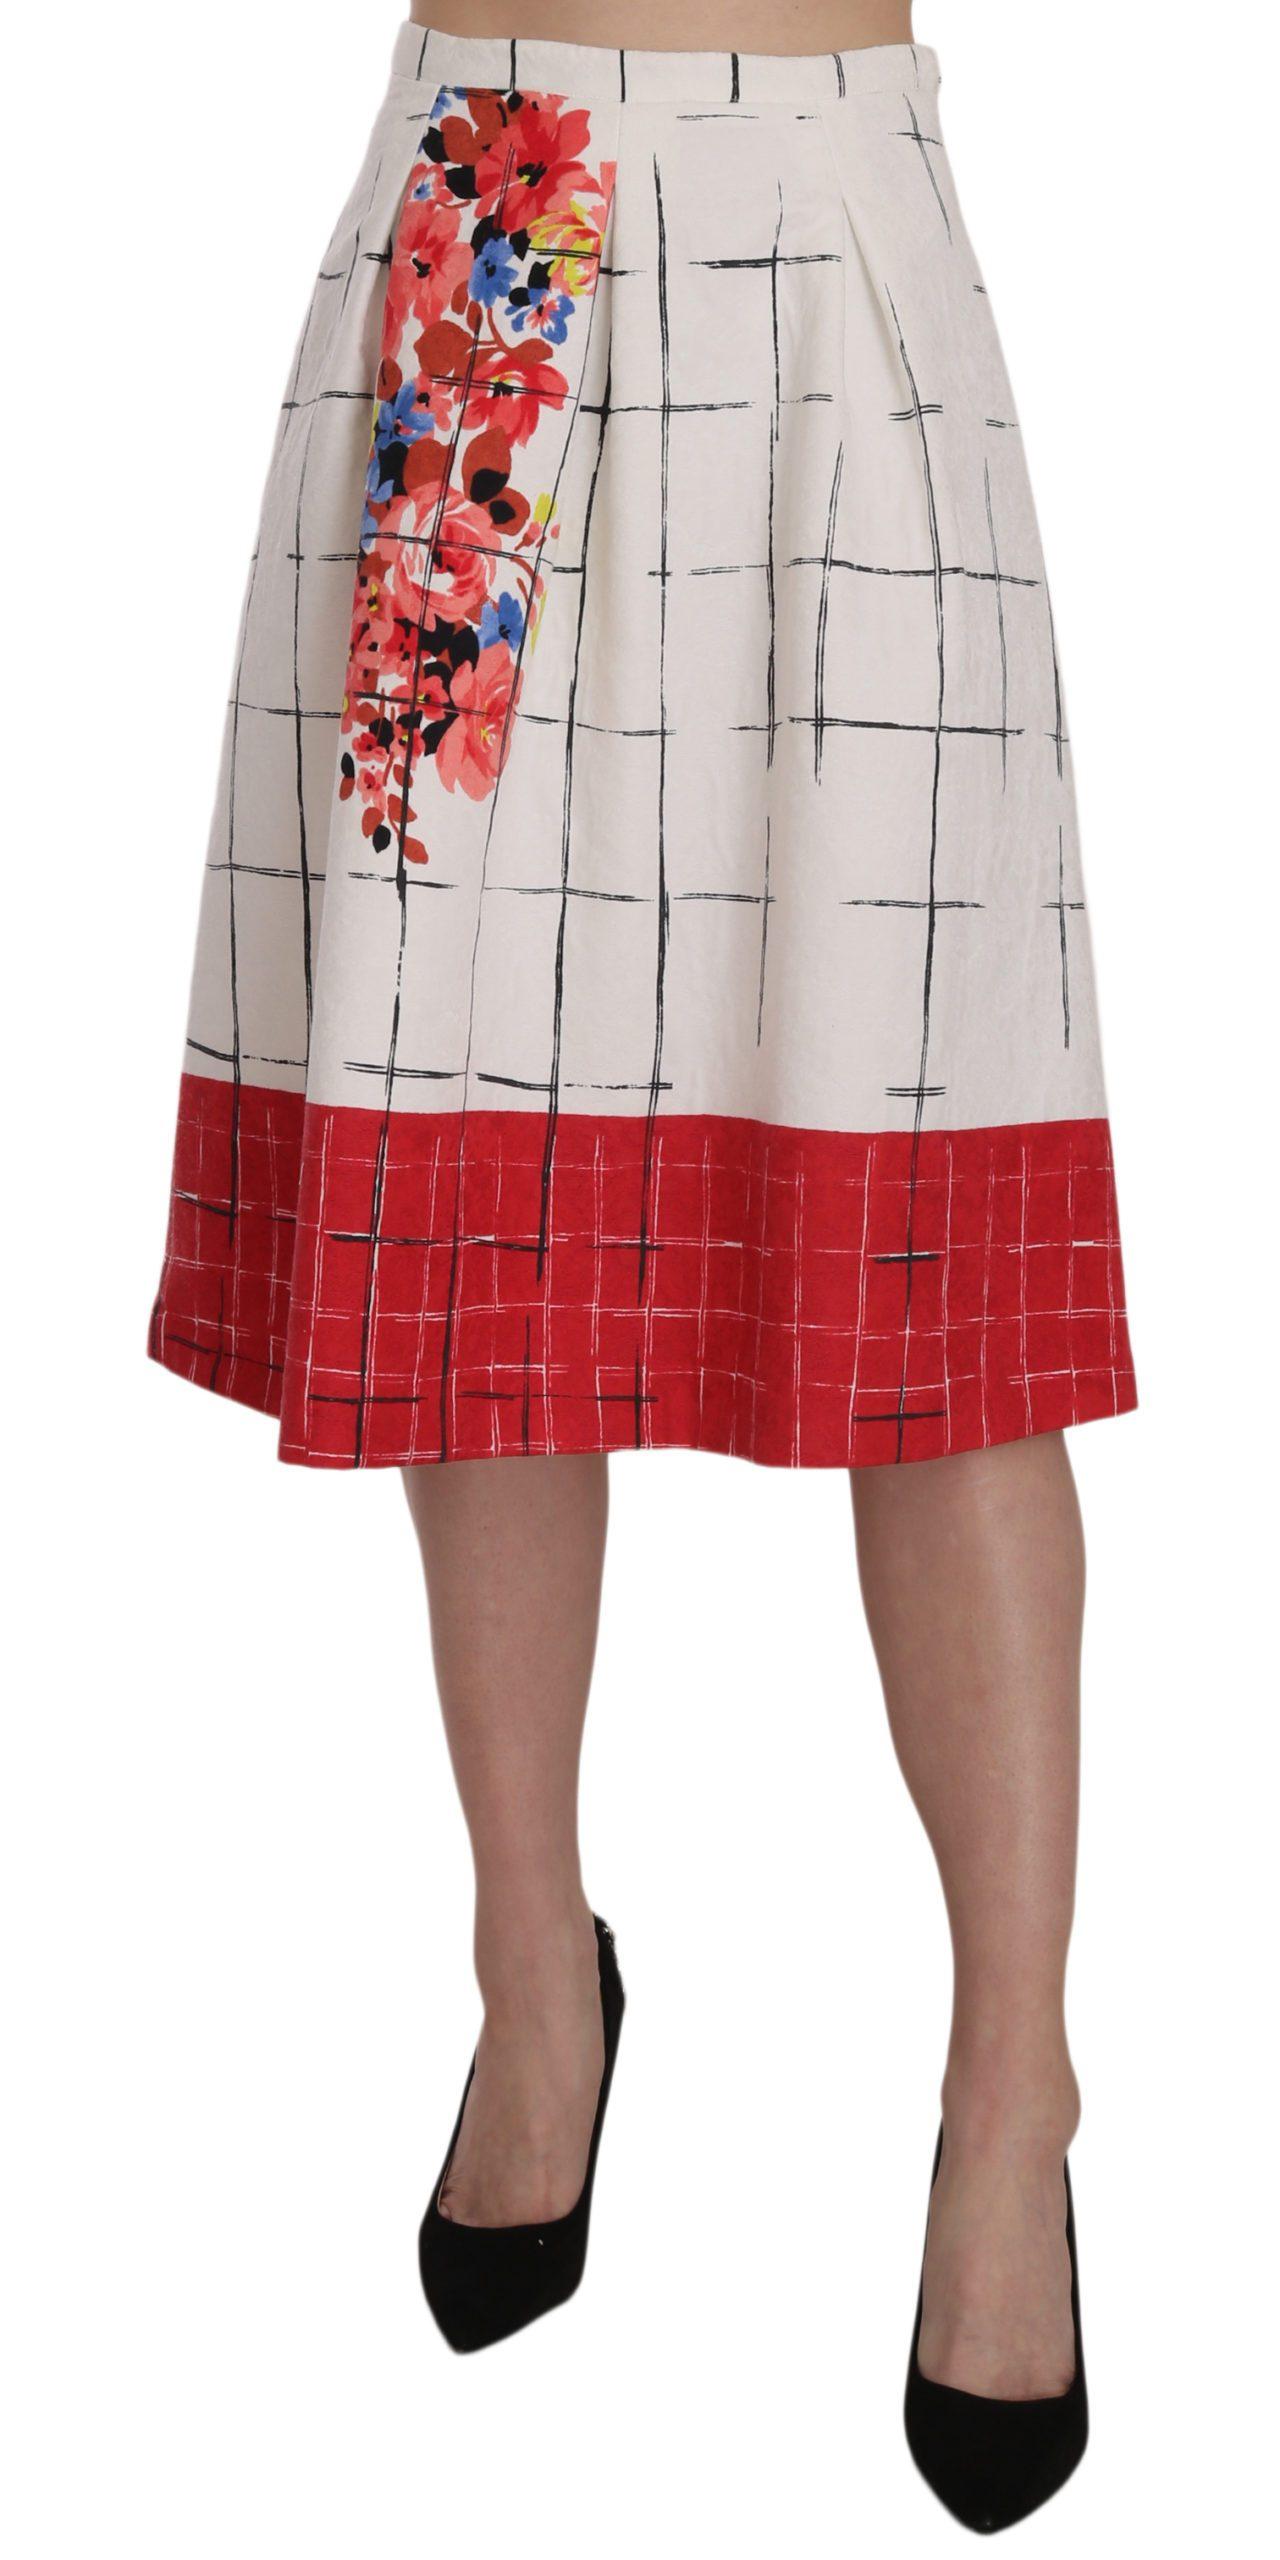 Liu Jo Women's Floral Print Lined Flared Midi Dress White PAN801 - IT42|M